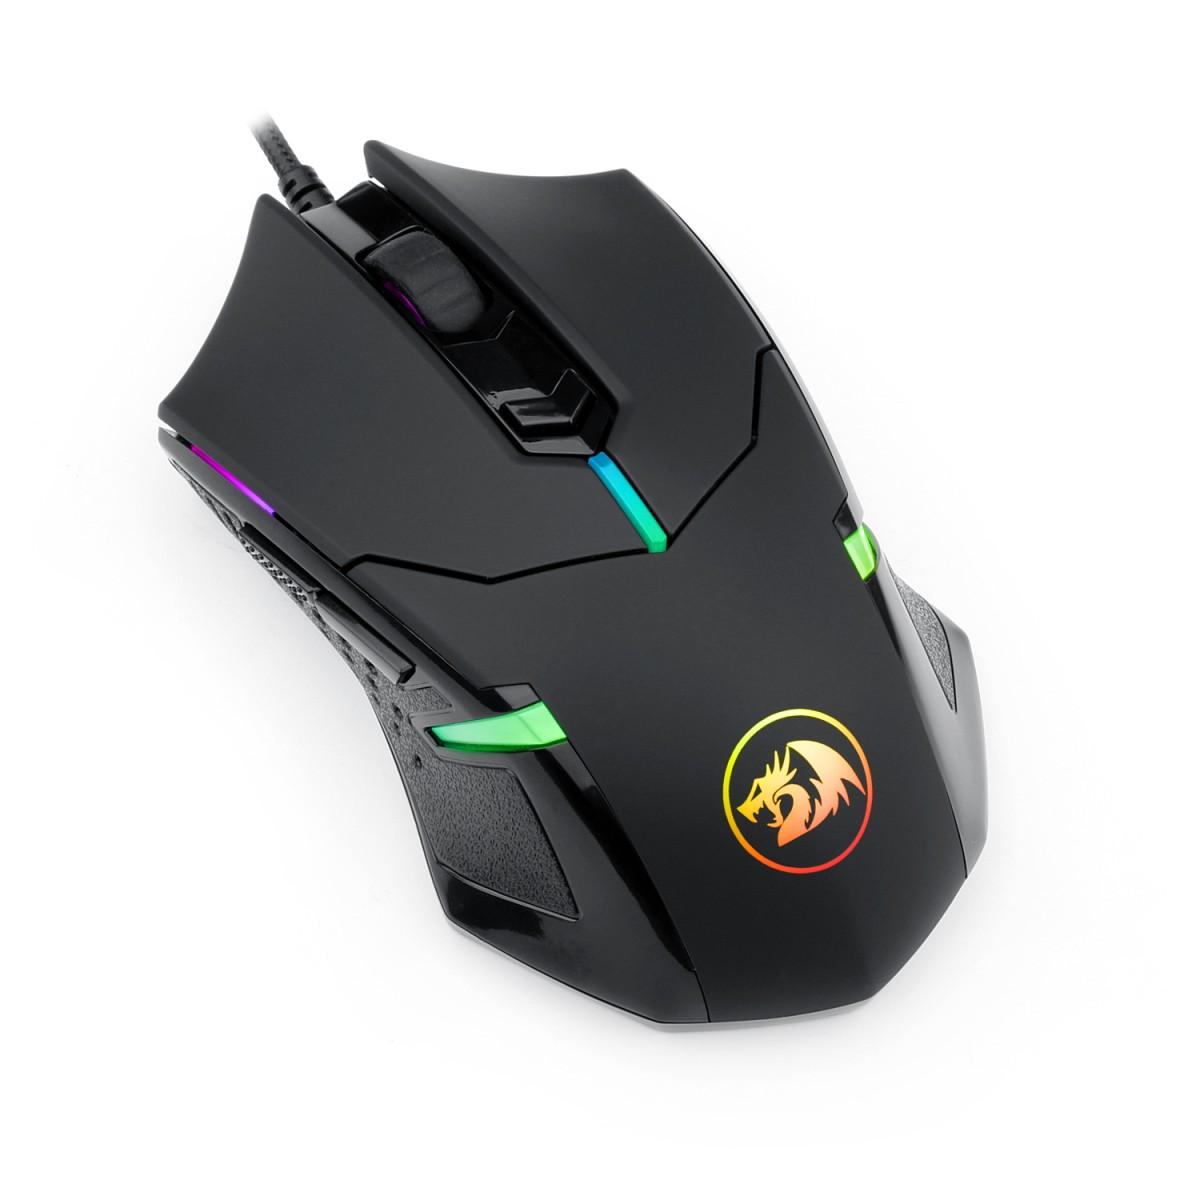 Mouse Gamer Redragon Centrophorus 2, 7200DPI, 6 Botões, RGB, Black, M601-RGB